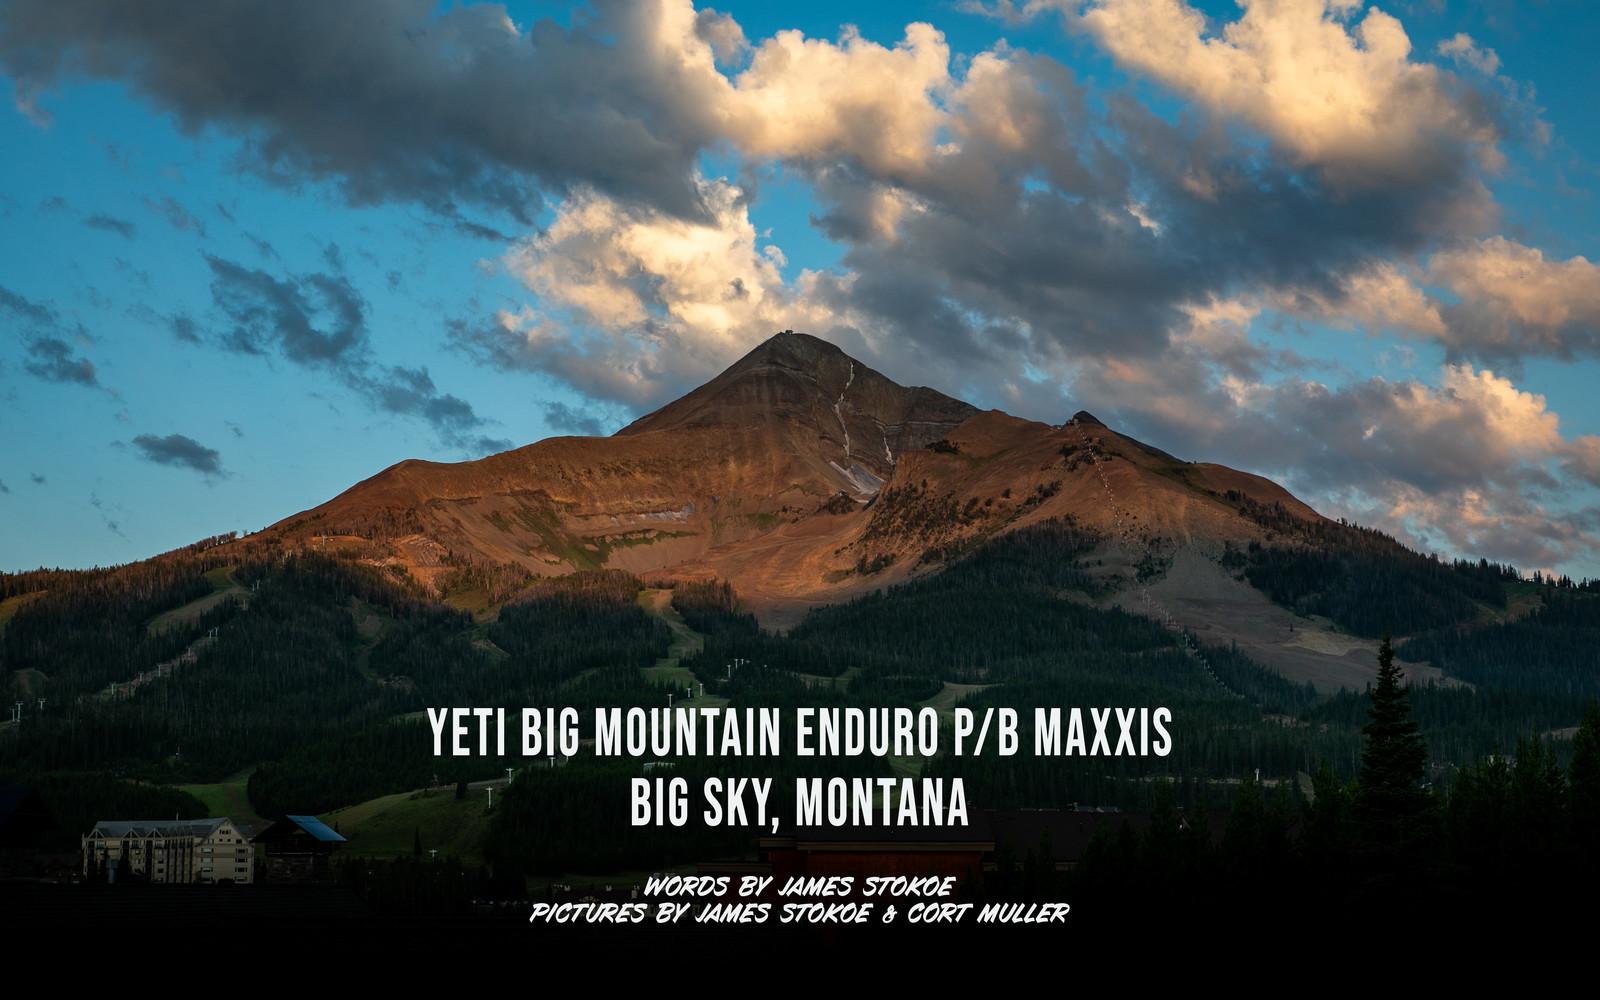 2019 Big Mountain Enduro - Stop #4 Big Sky, Montana